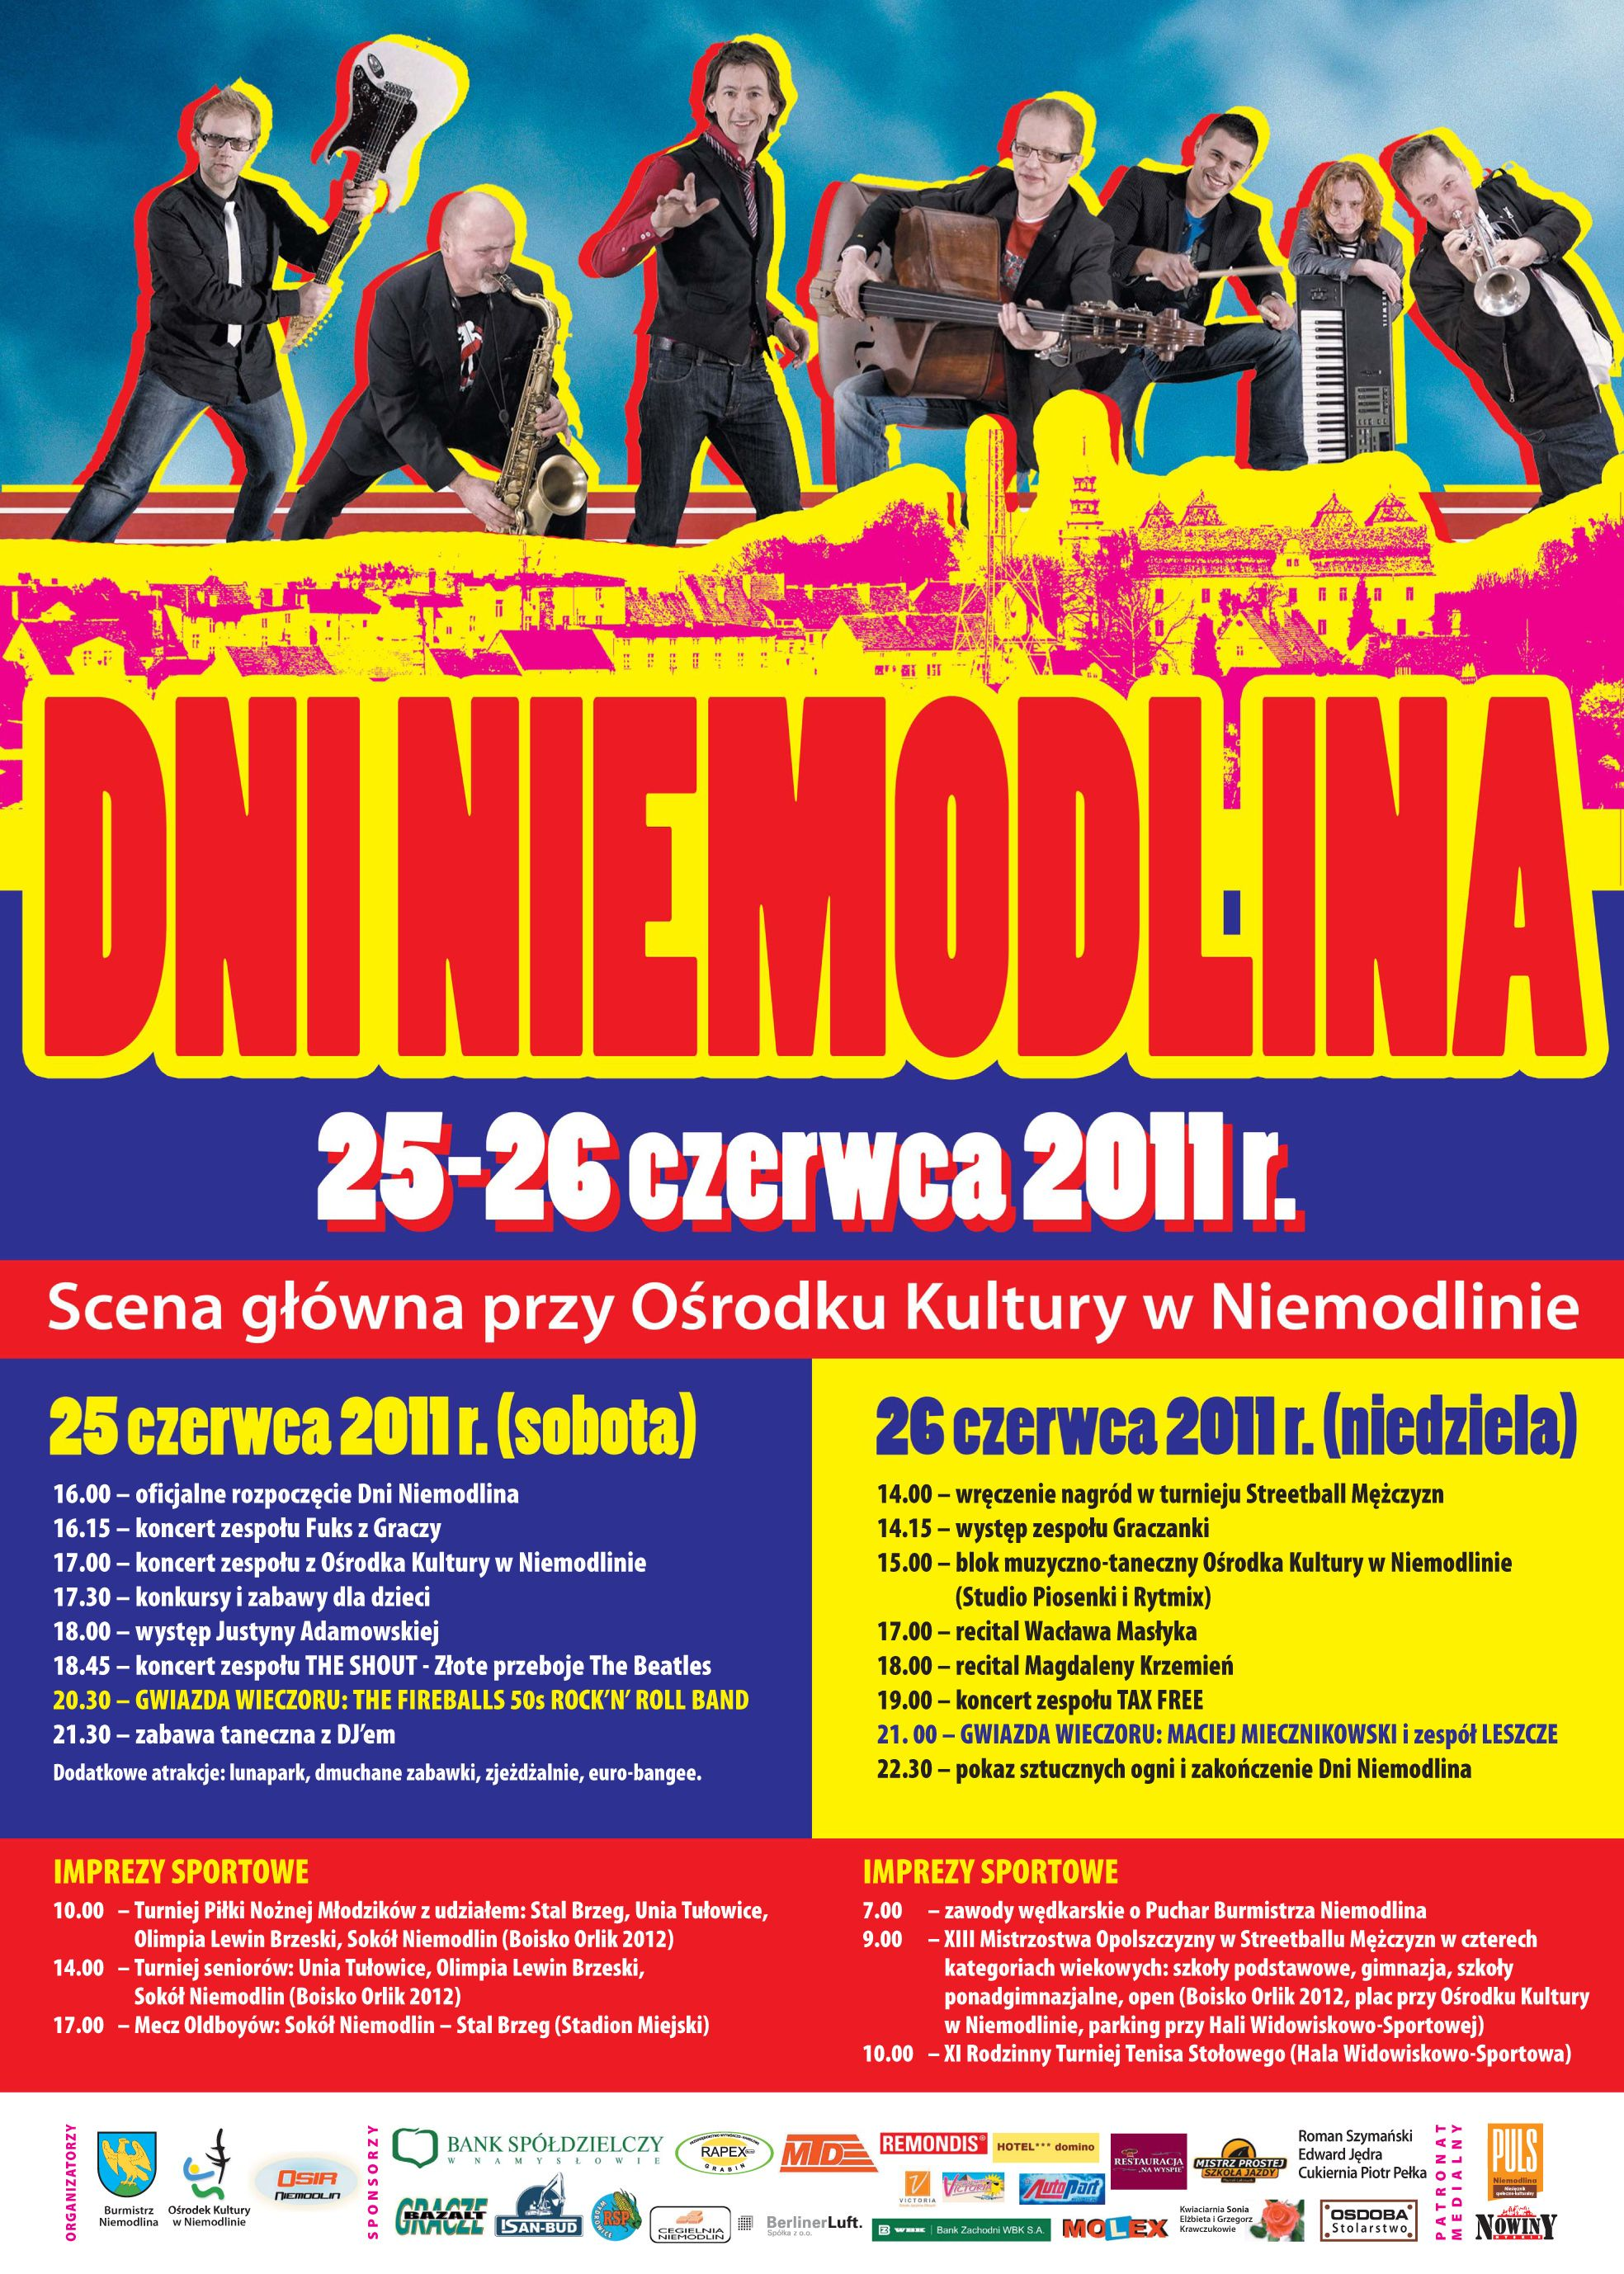 Dni_Niemodlina 2011.jpeg